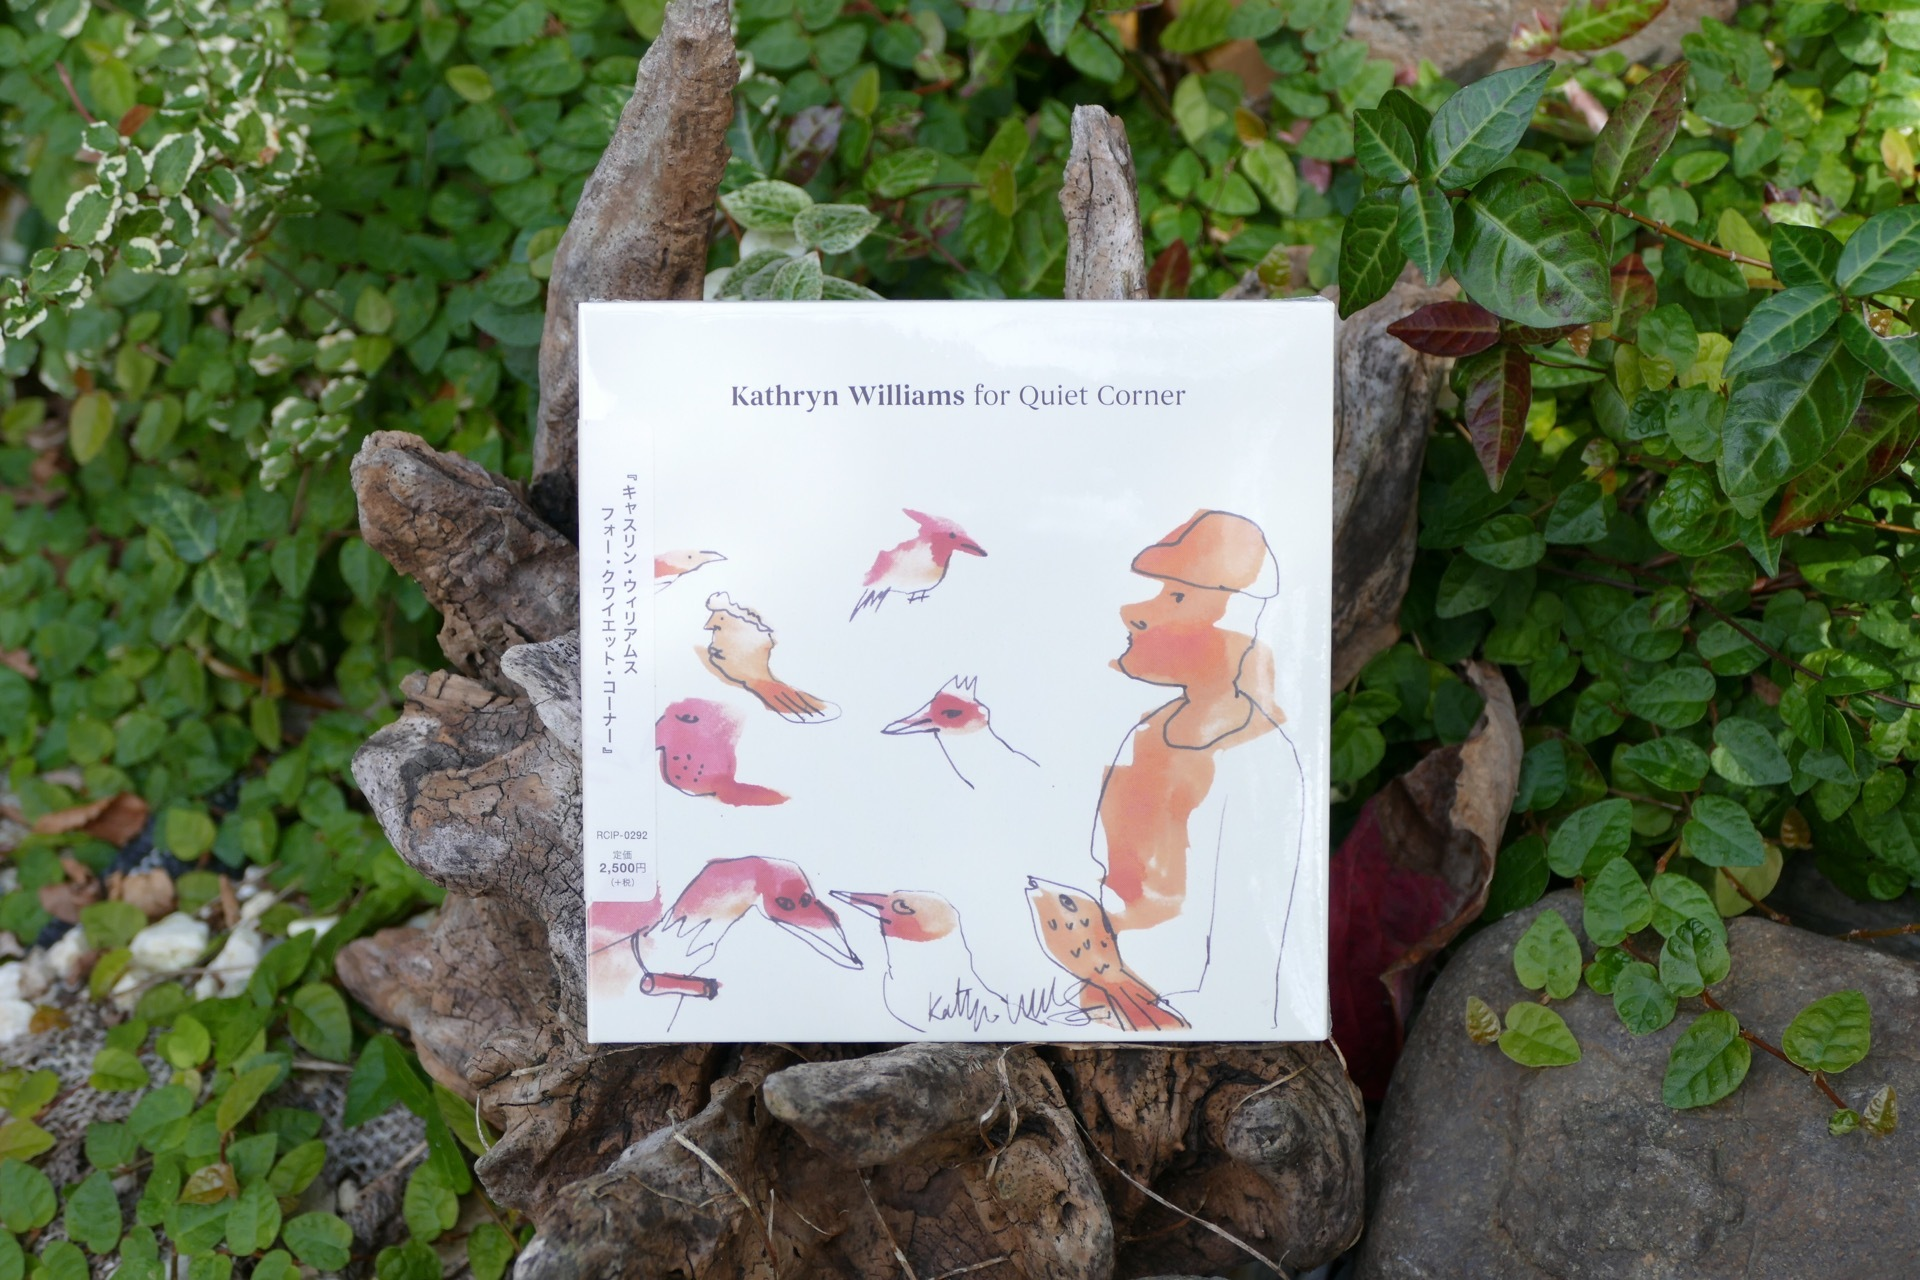 Kathryn Williams for Quiet Corner